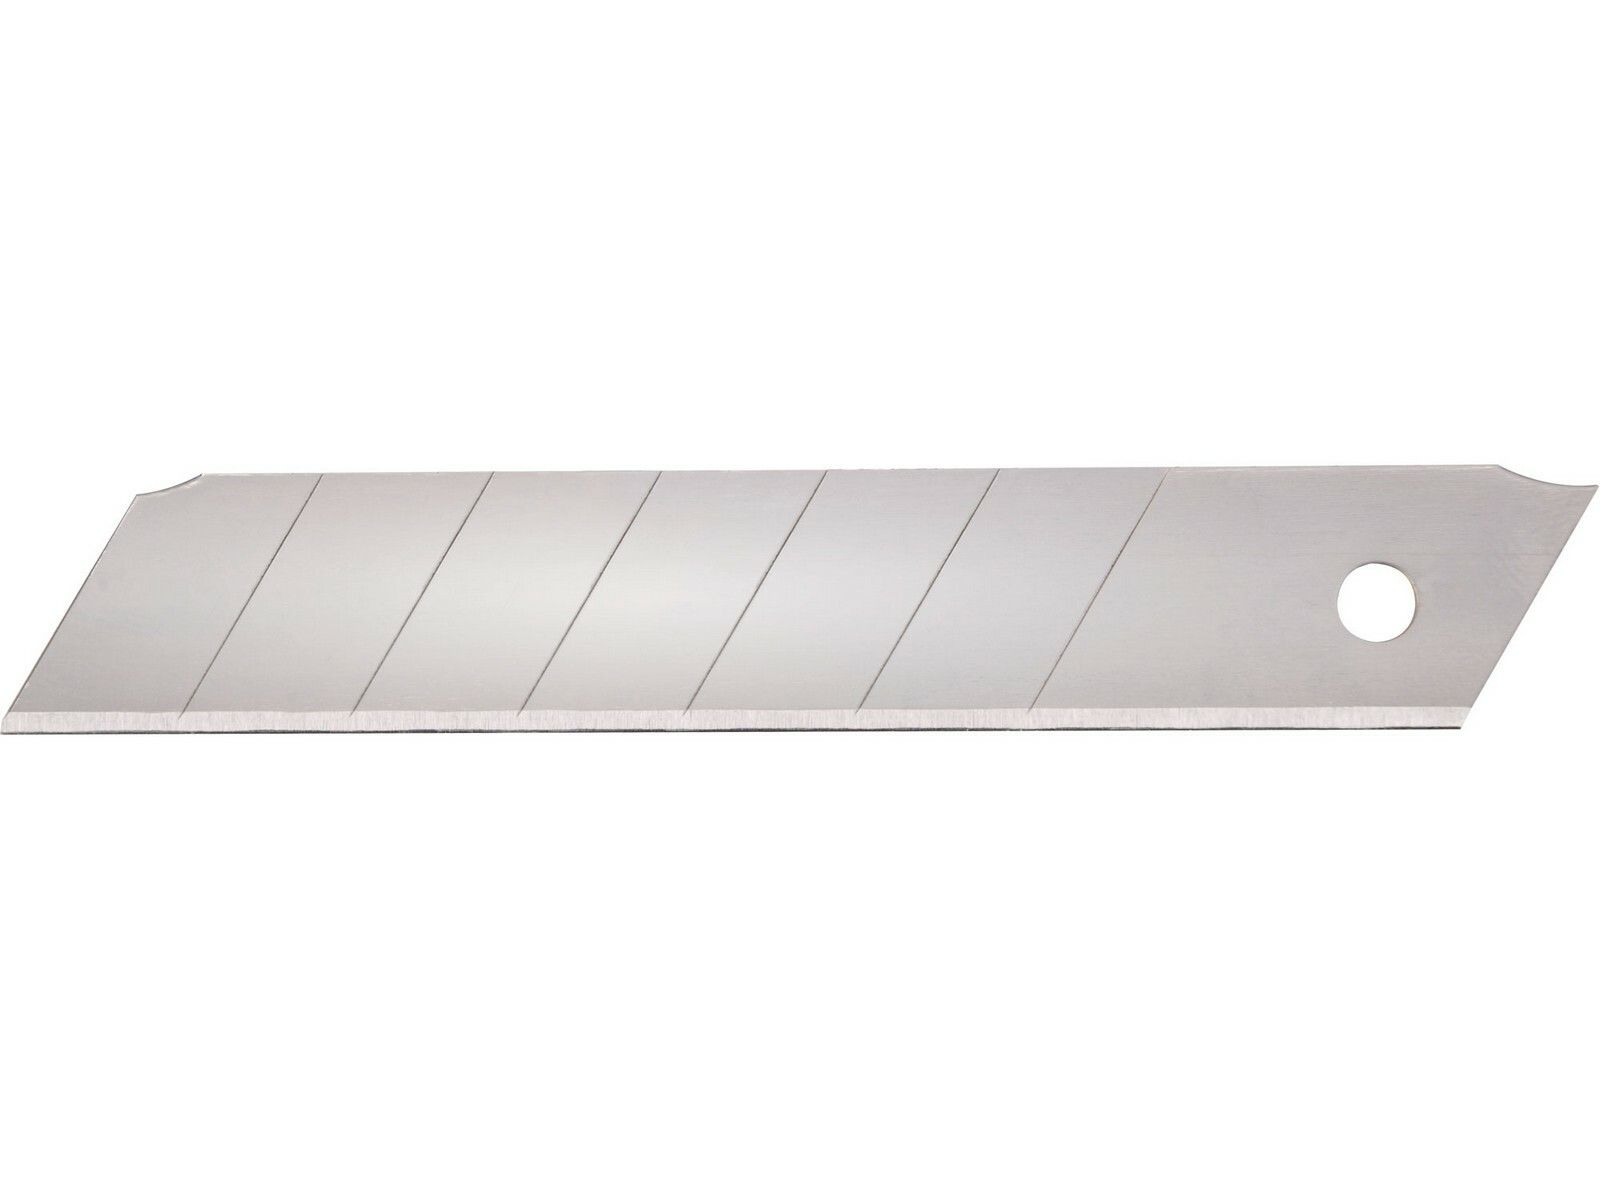 Břity ulamovací do nože, 25mm, 10ks, SK4 EXTOL-PREMIUM